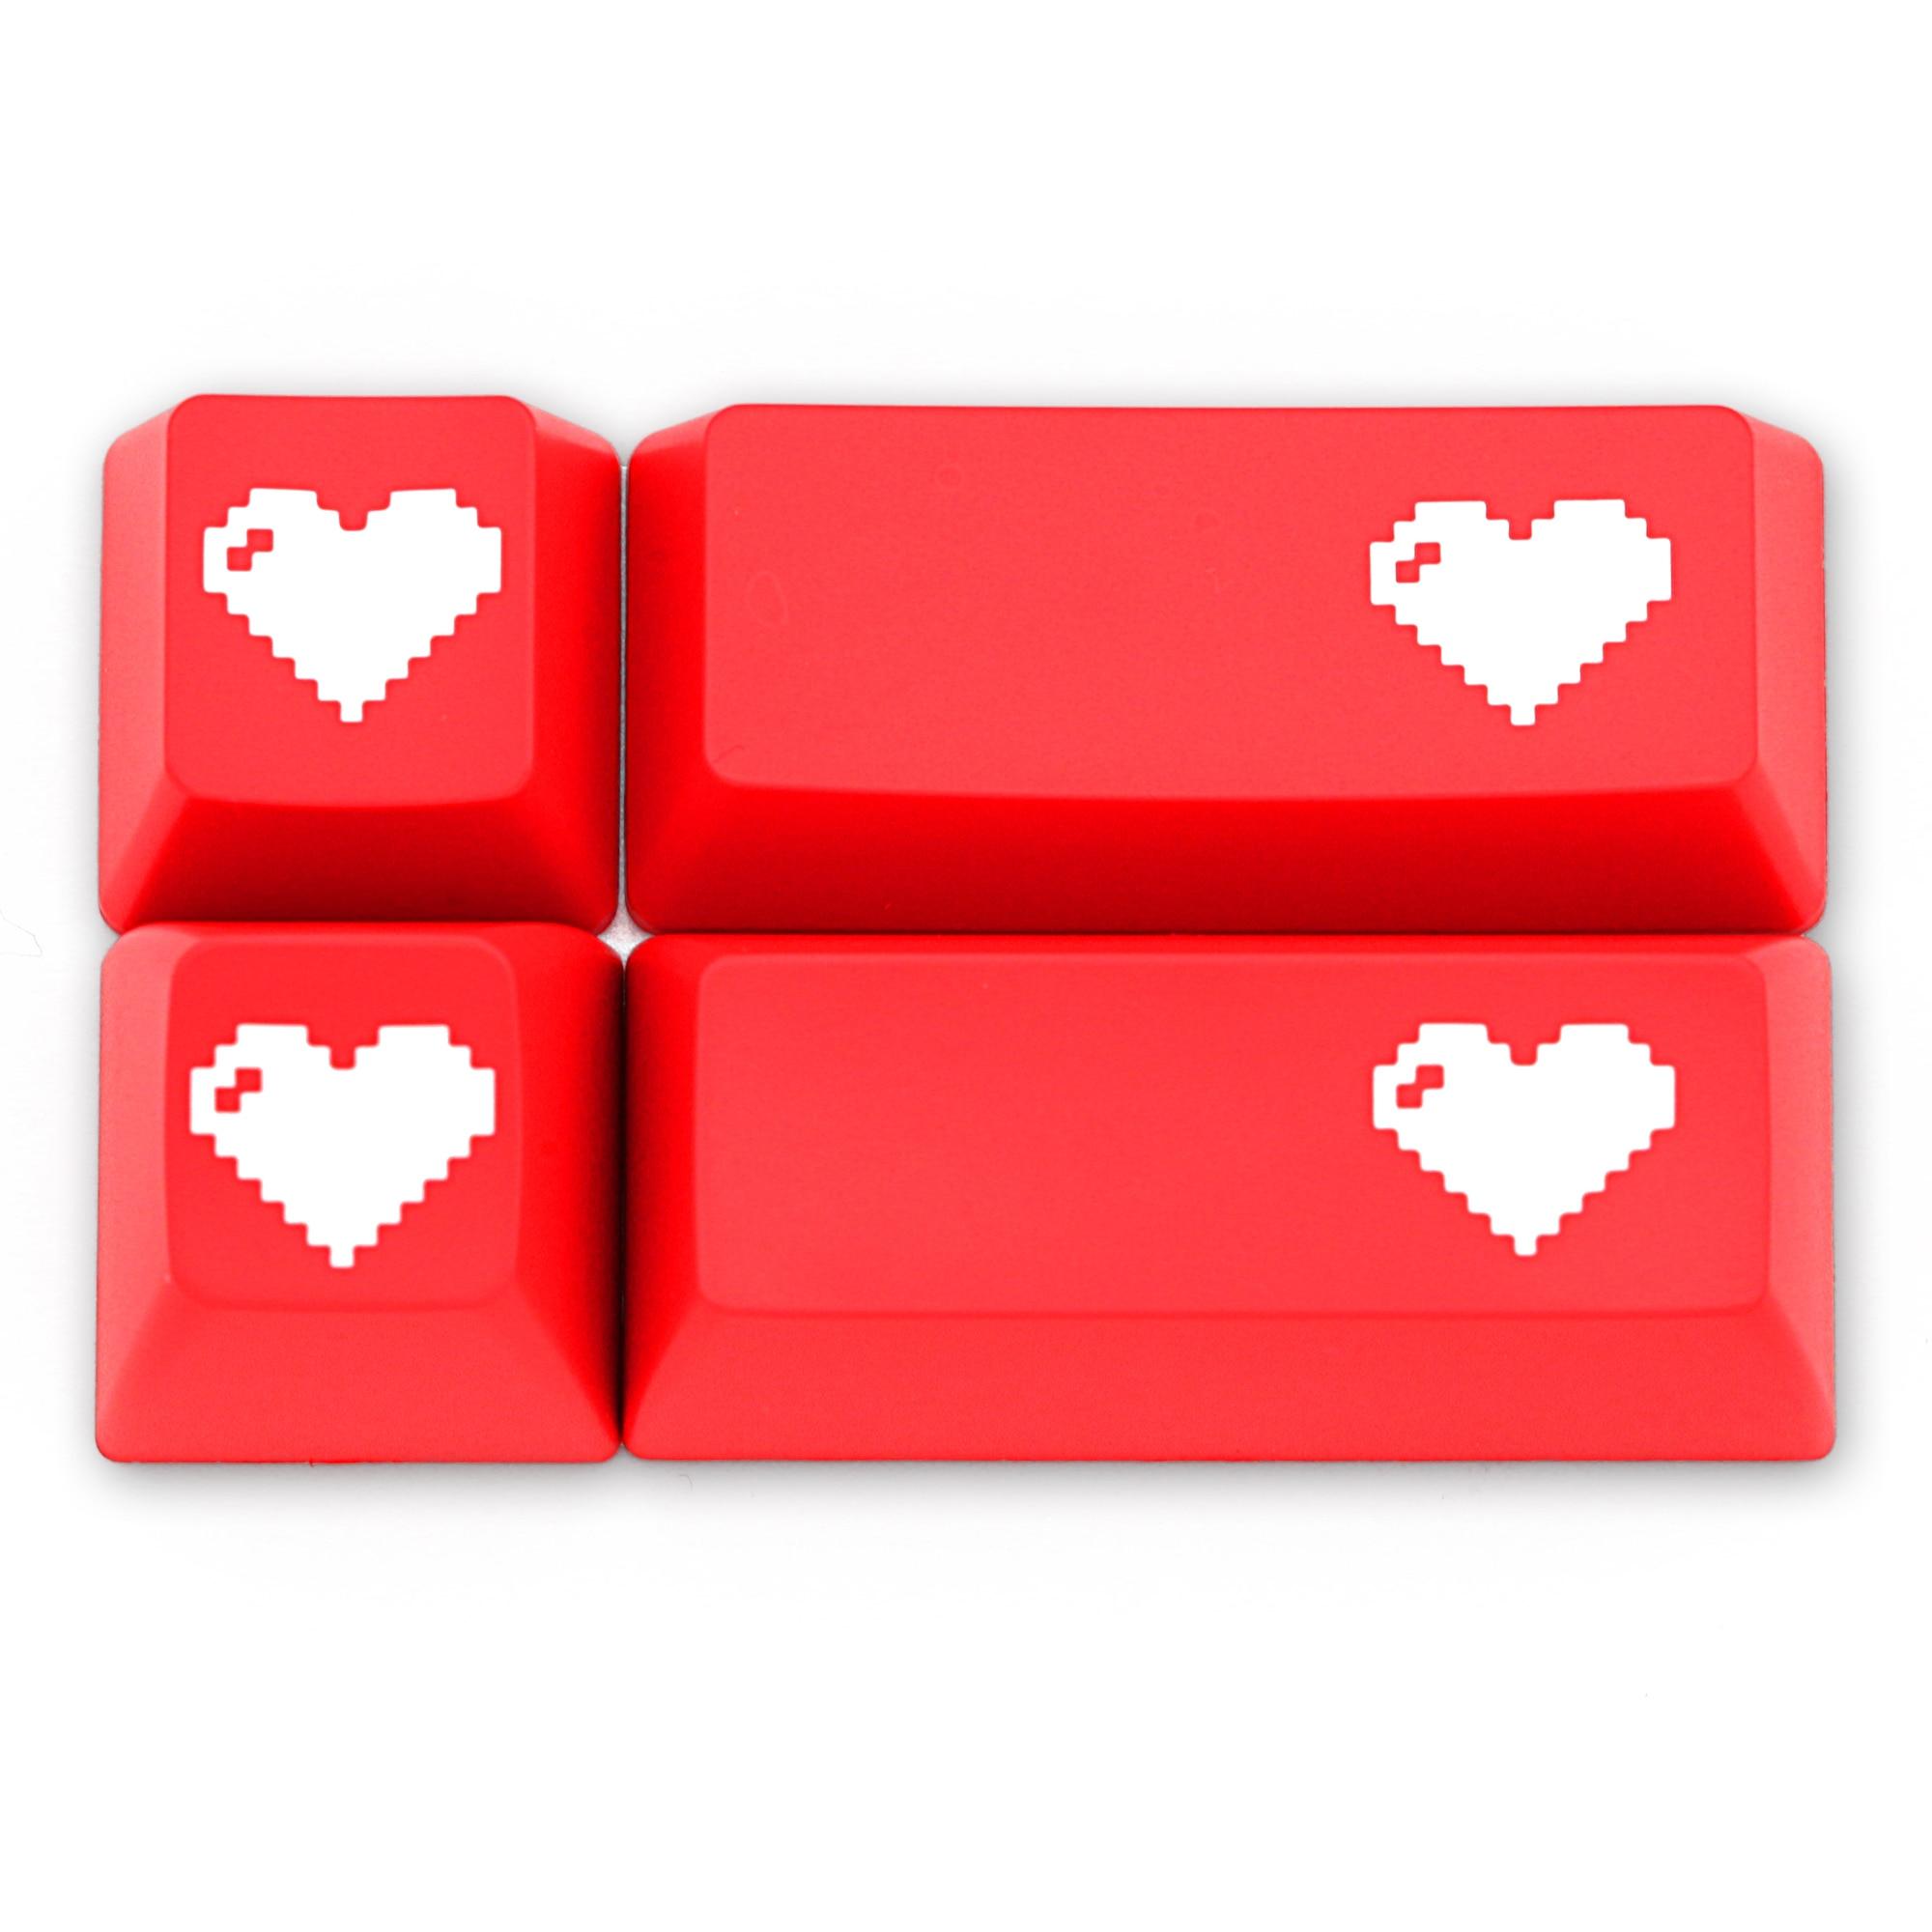 Domikey SA Abs Doubleshot Keycap Pixel Heart Red For Oem Dsa Sa Cherry Profile Poker 87 104 Gh60 Xd64 Xd68 Xd84 Xd96 Xd75 Xd87